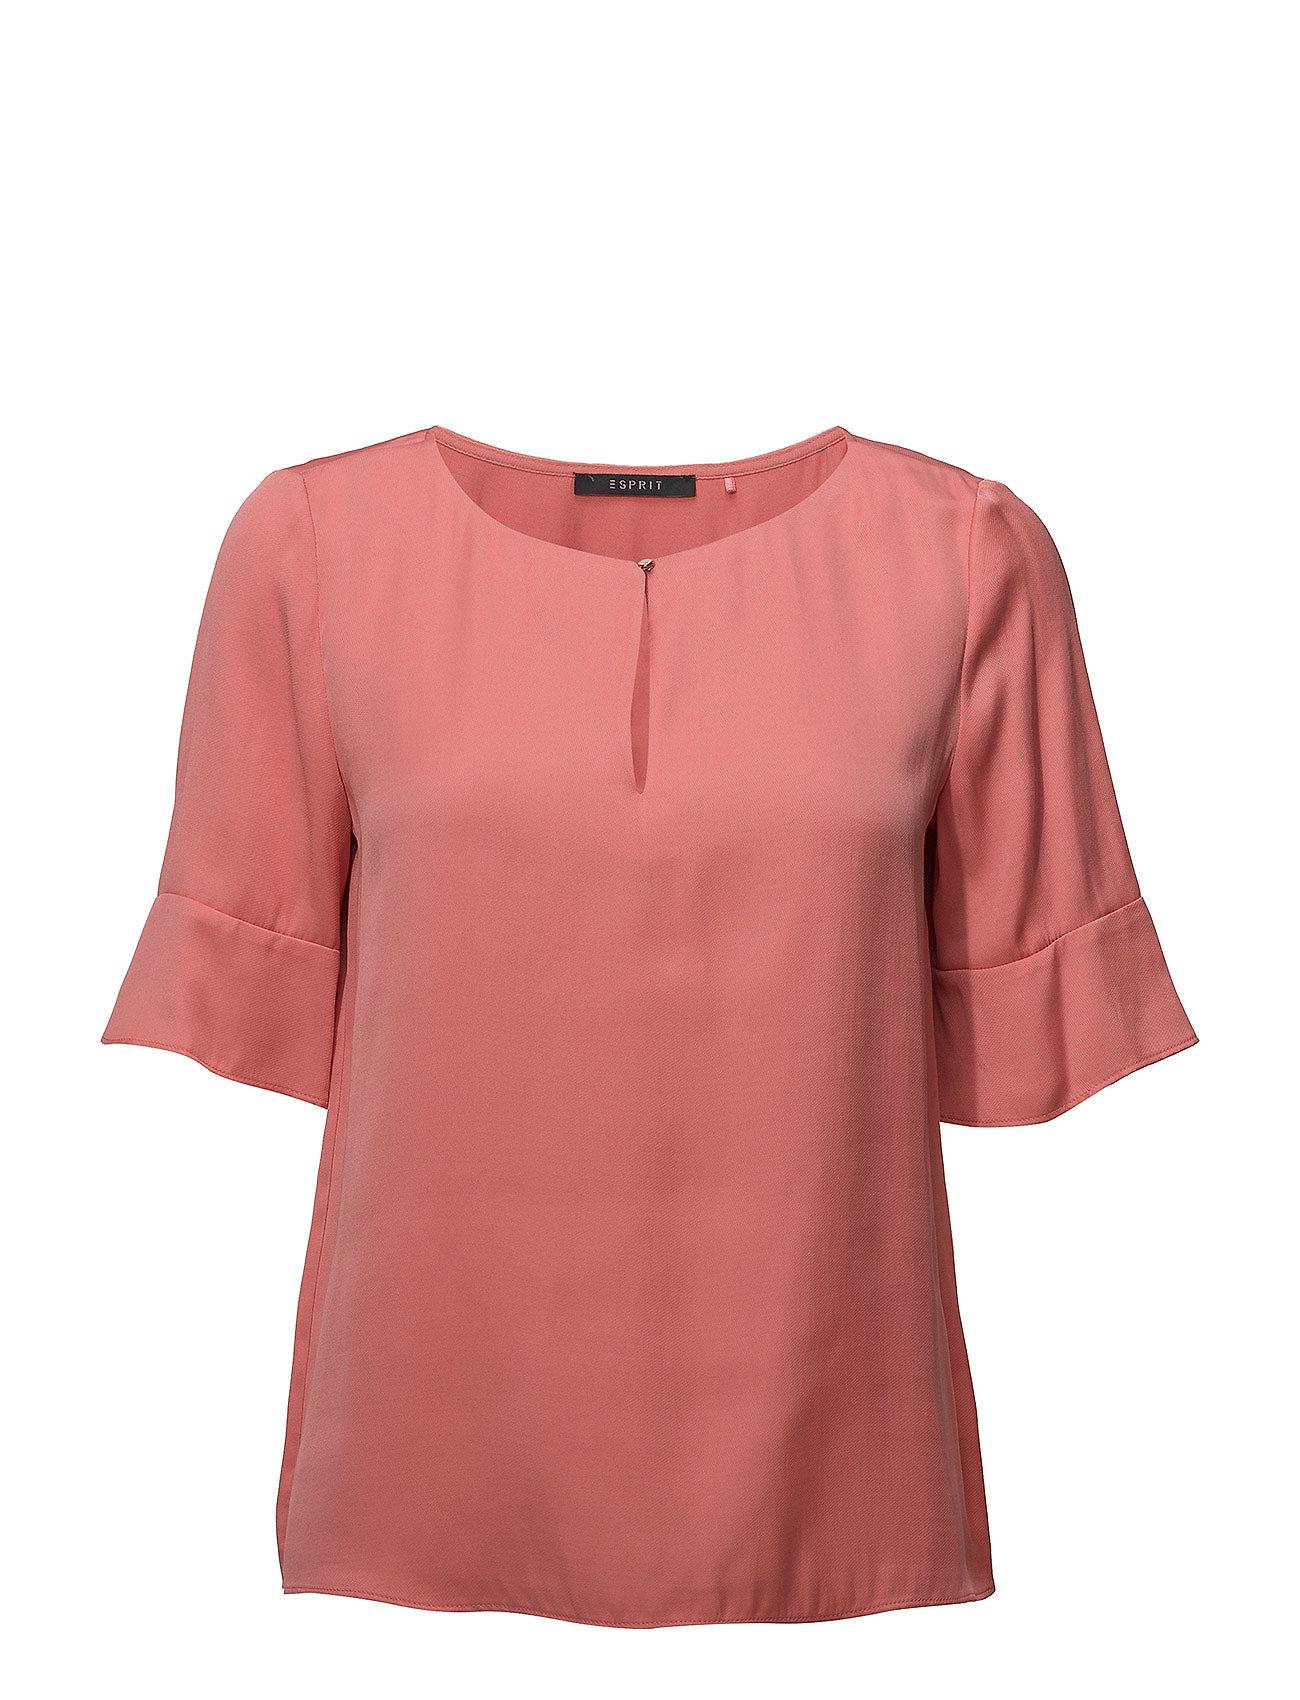 Esprit Collection Blouses woven - CORAL